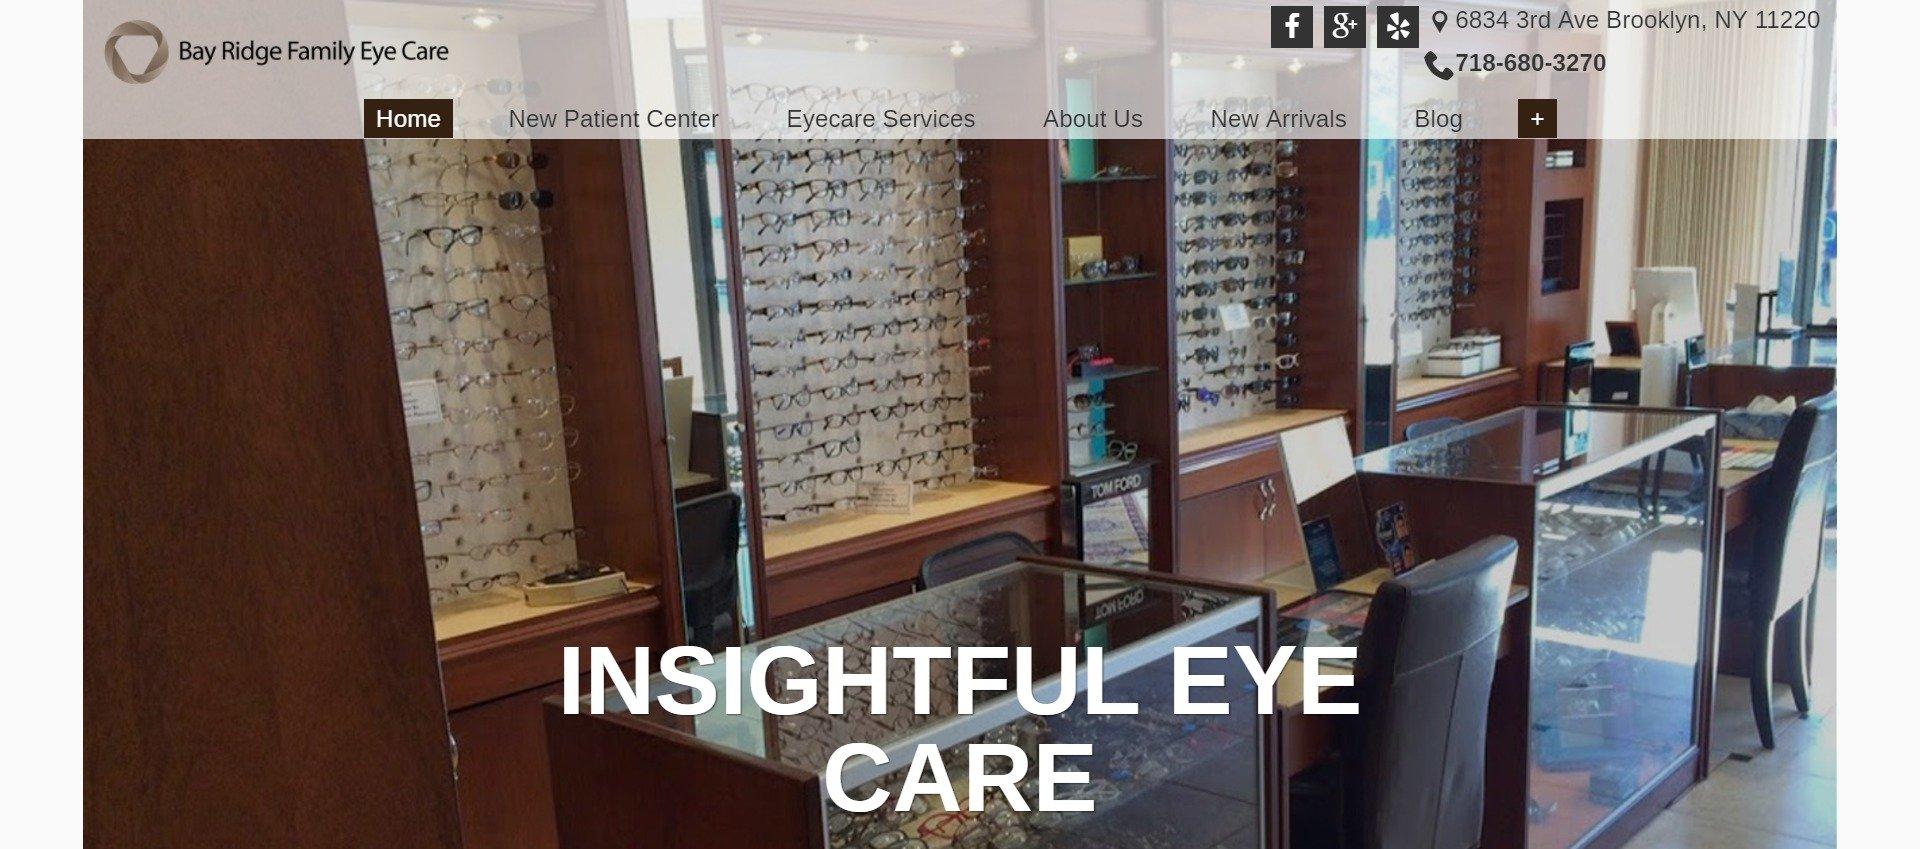 best-optometry-websites-www.bayridgefamilyeyecare.com